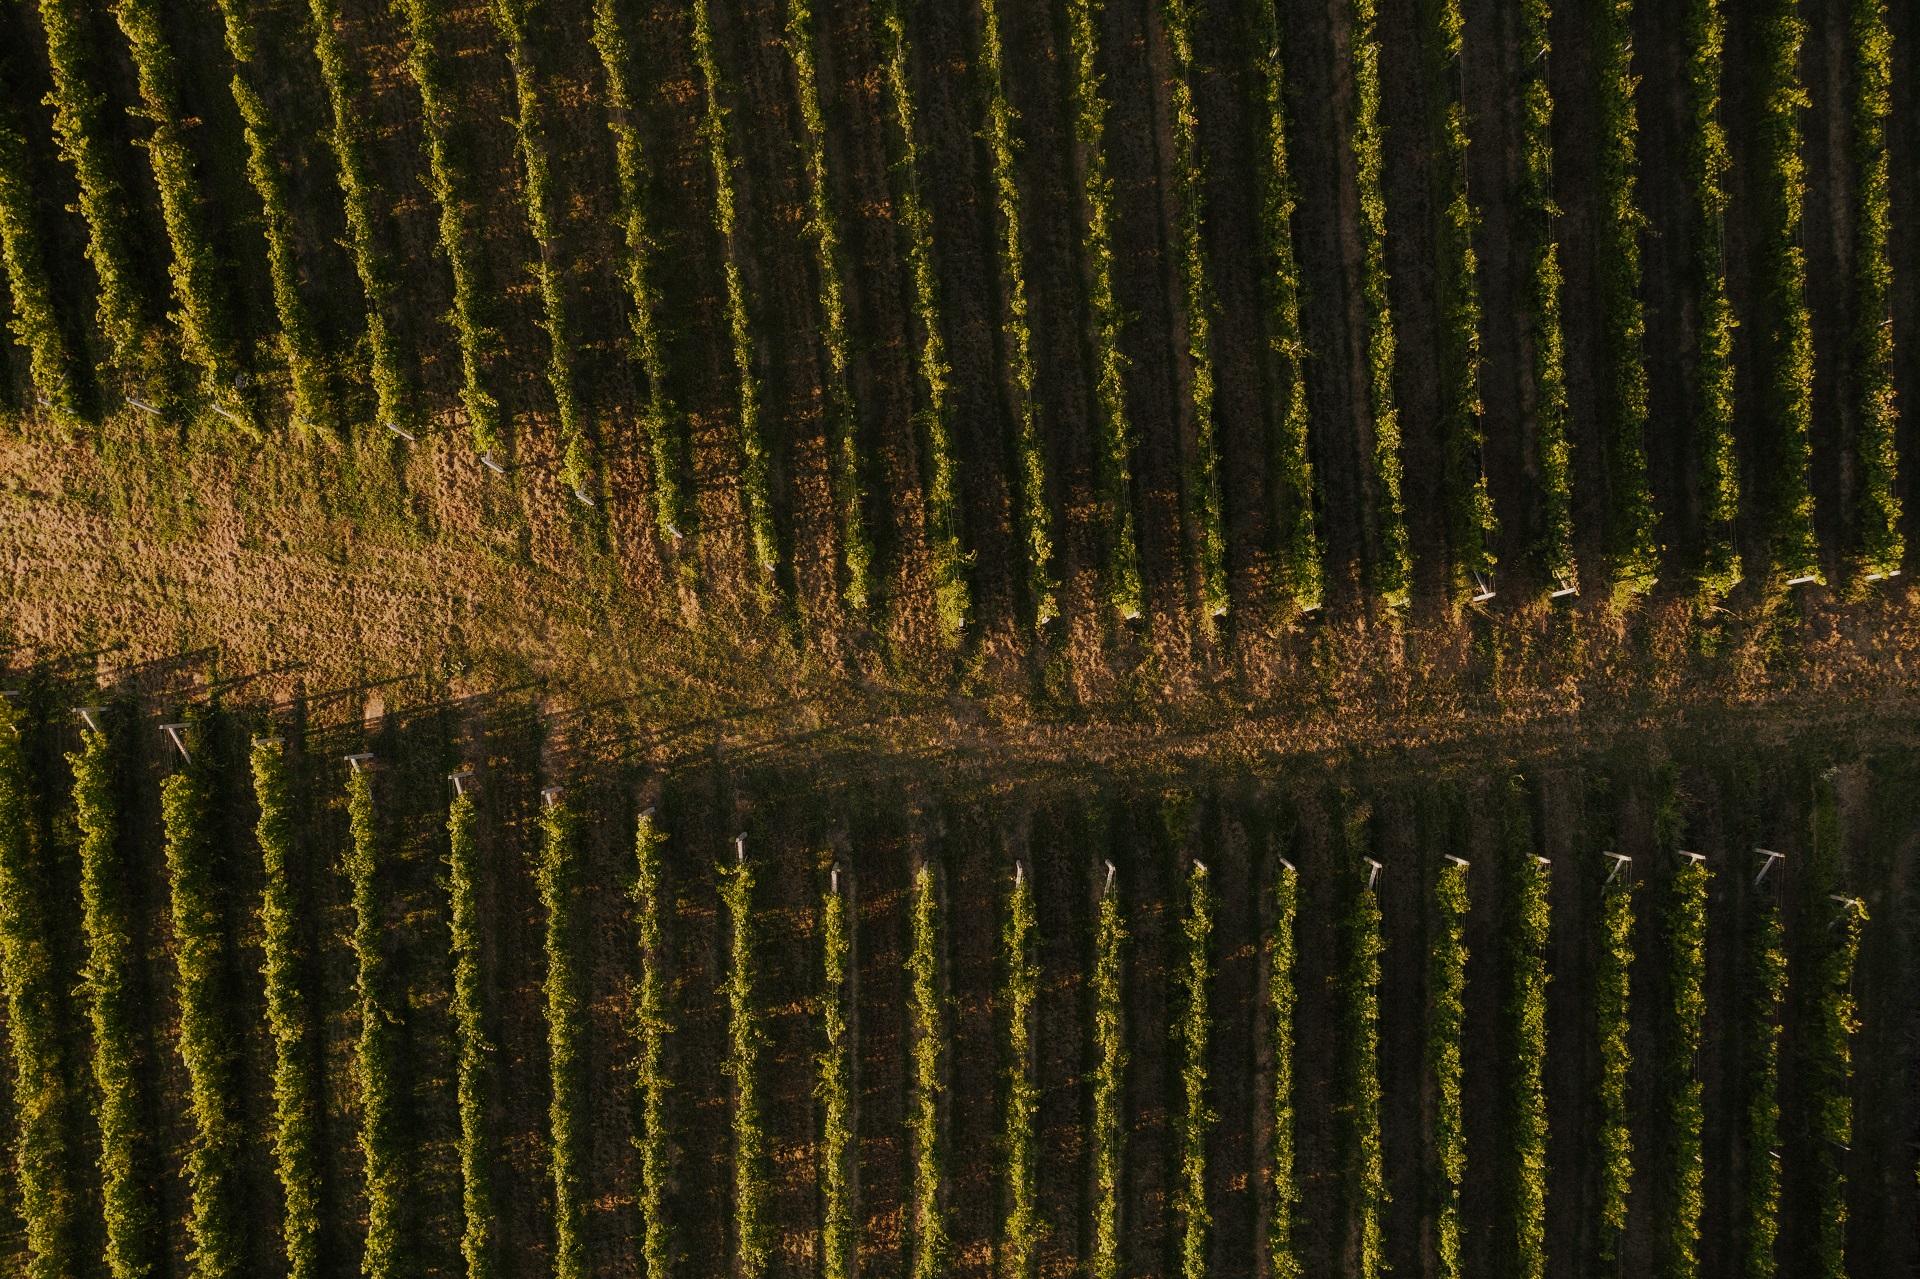 5 reasons why food and wine lovers should visit Croatia's Moslavina region